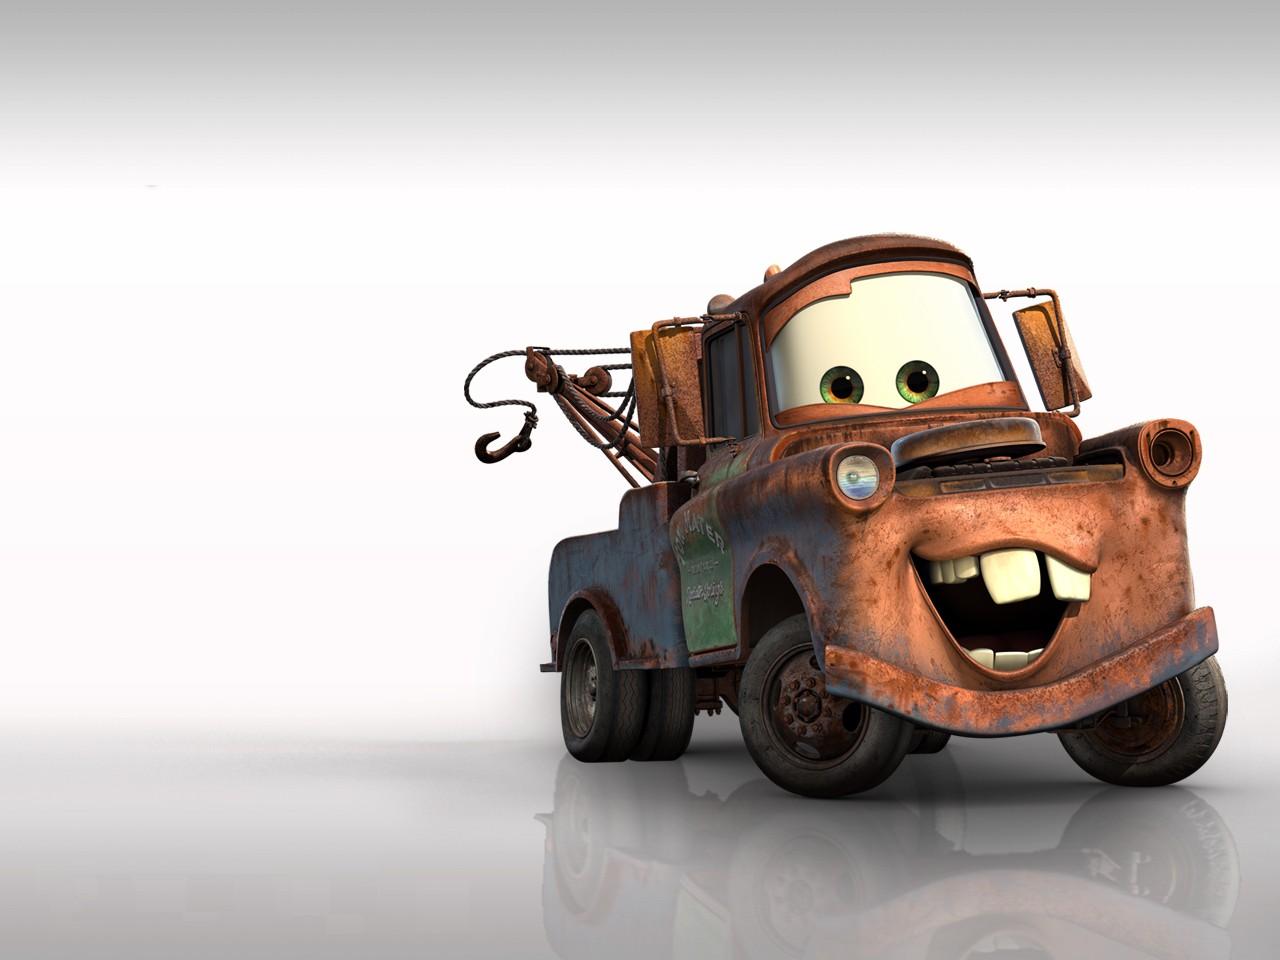 Film Cars - Mater || Top Wallpapers Download .blogspot.com